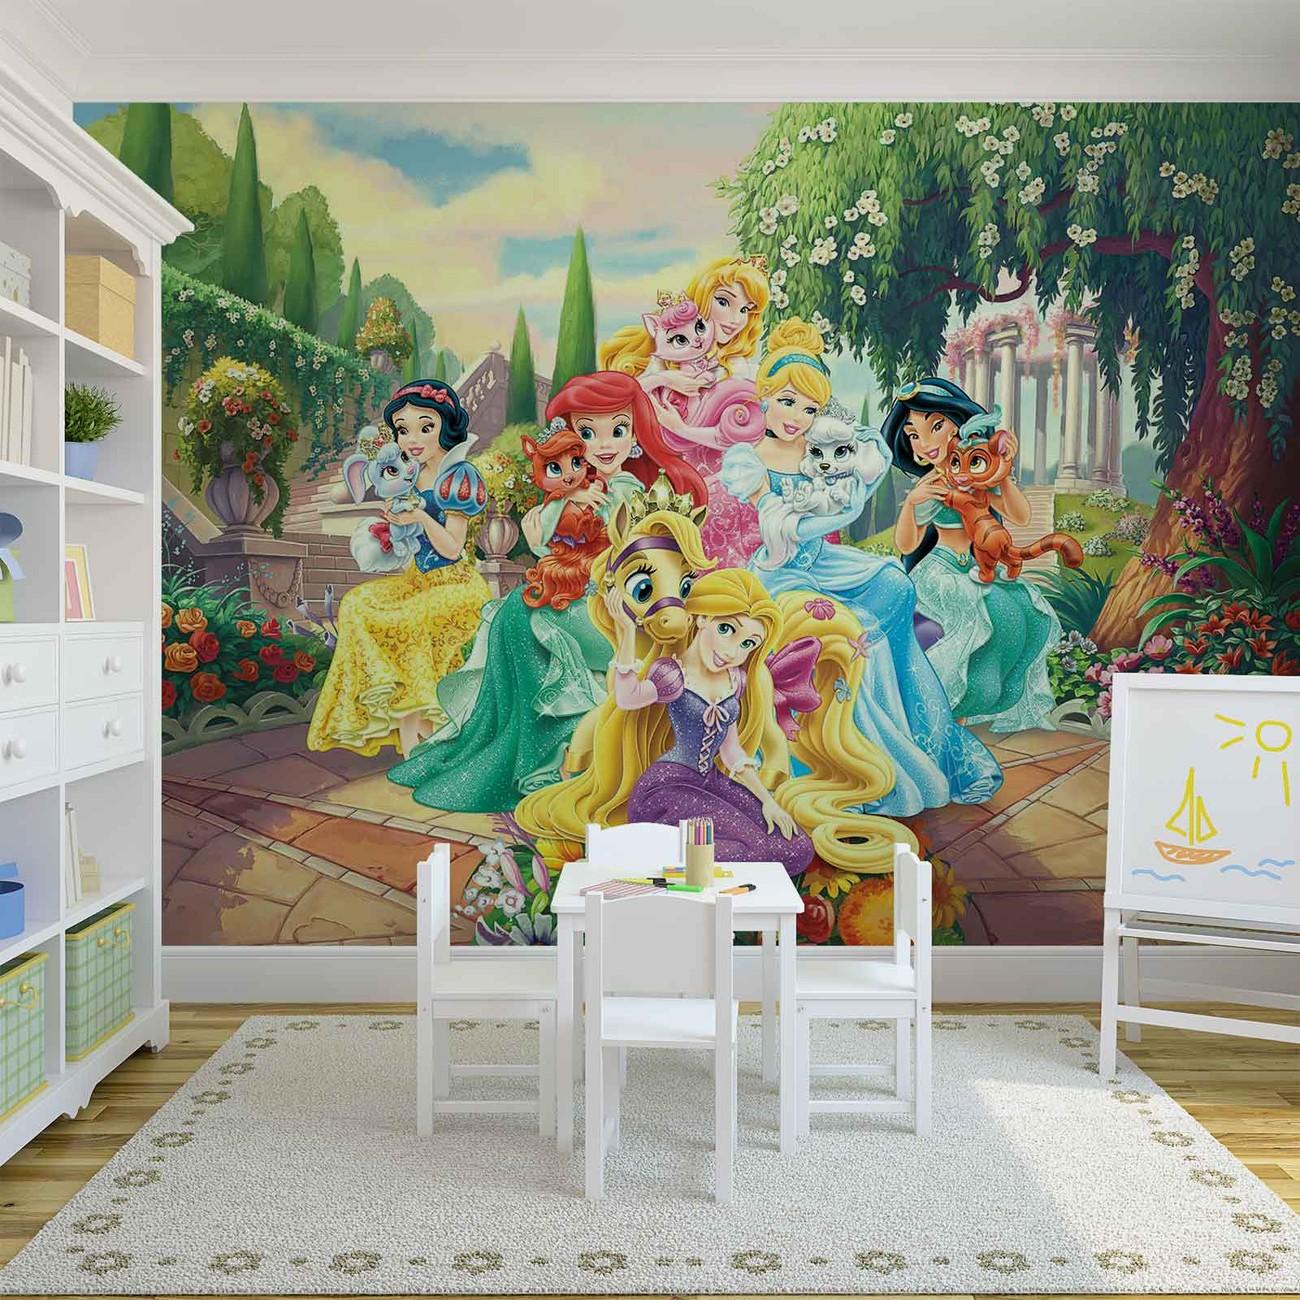 5deac256adc5 Fototapeta Disney Princezné Rapunzel Ariel - Tapeta na stenu na ...